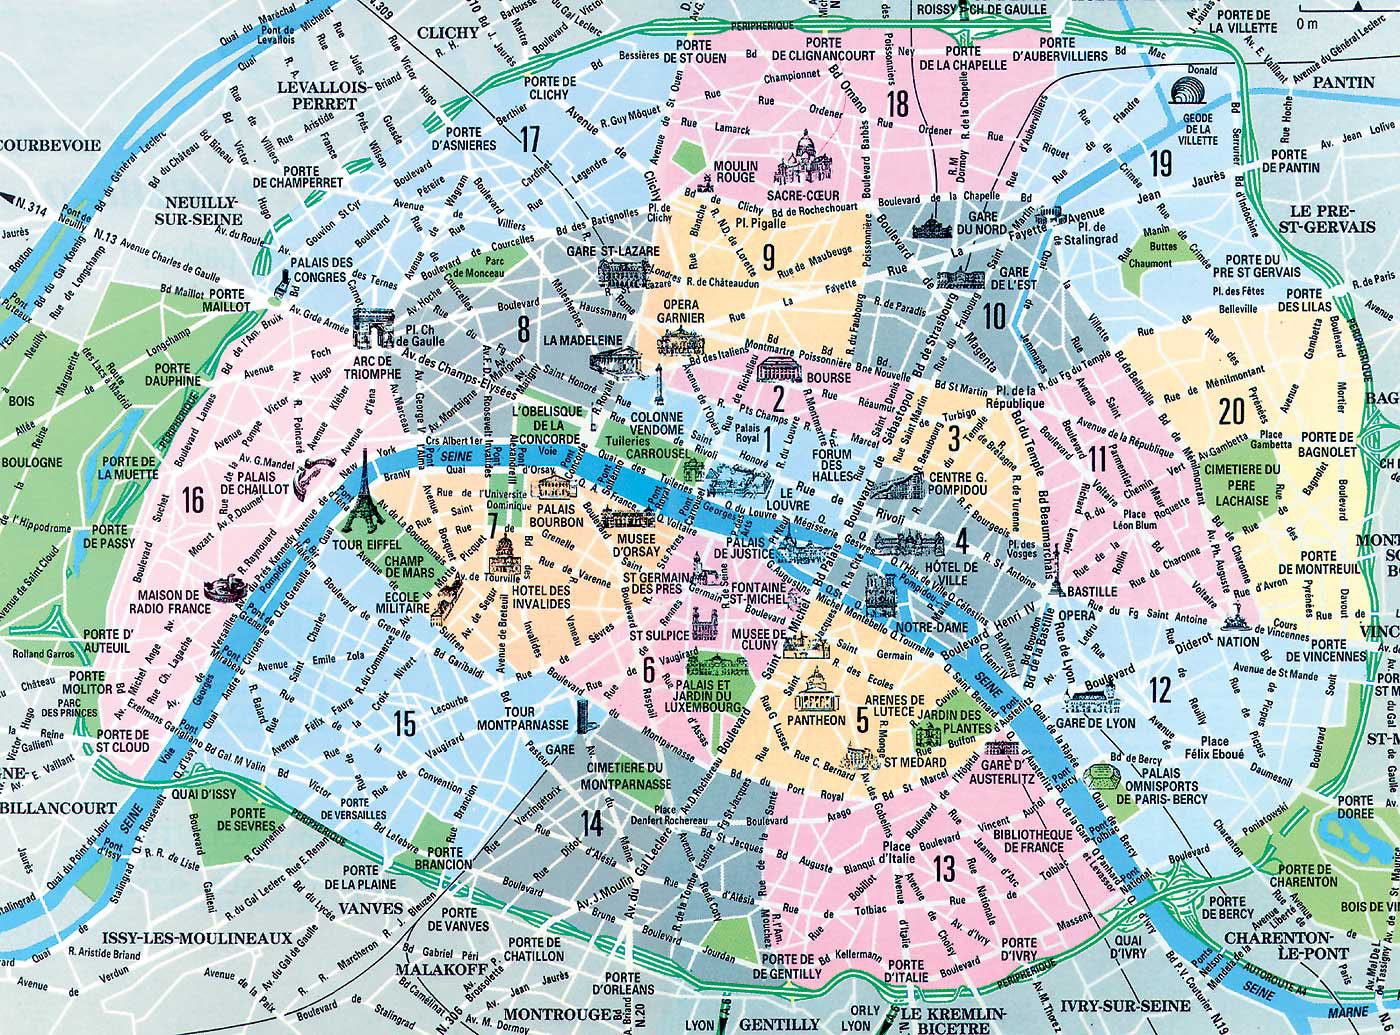 Map Of Paris Arrondissements. Top Arrondissement Sights. - Printable Map Of Paris Arrondissements